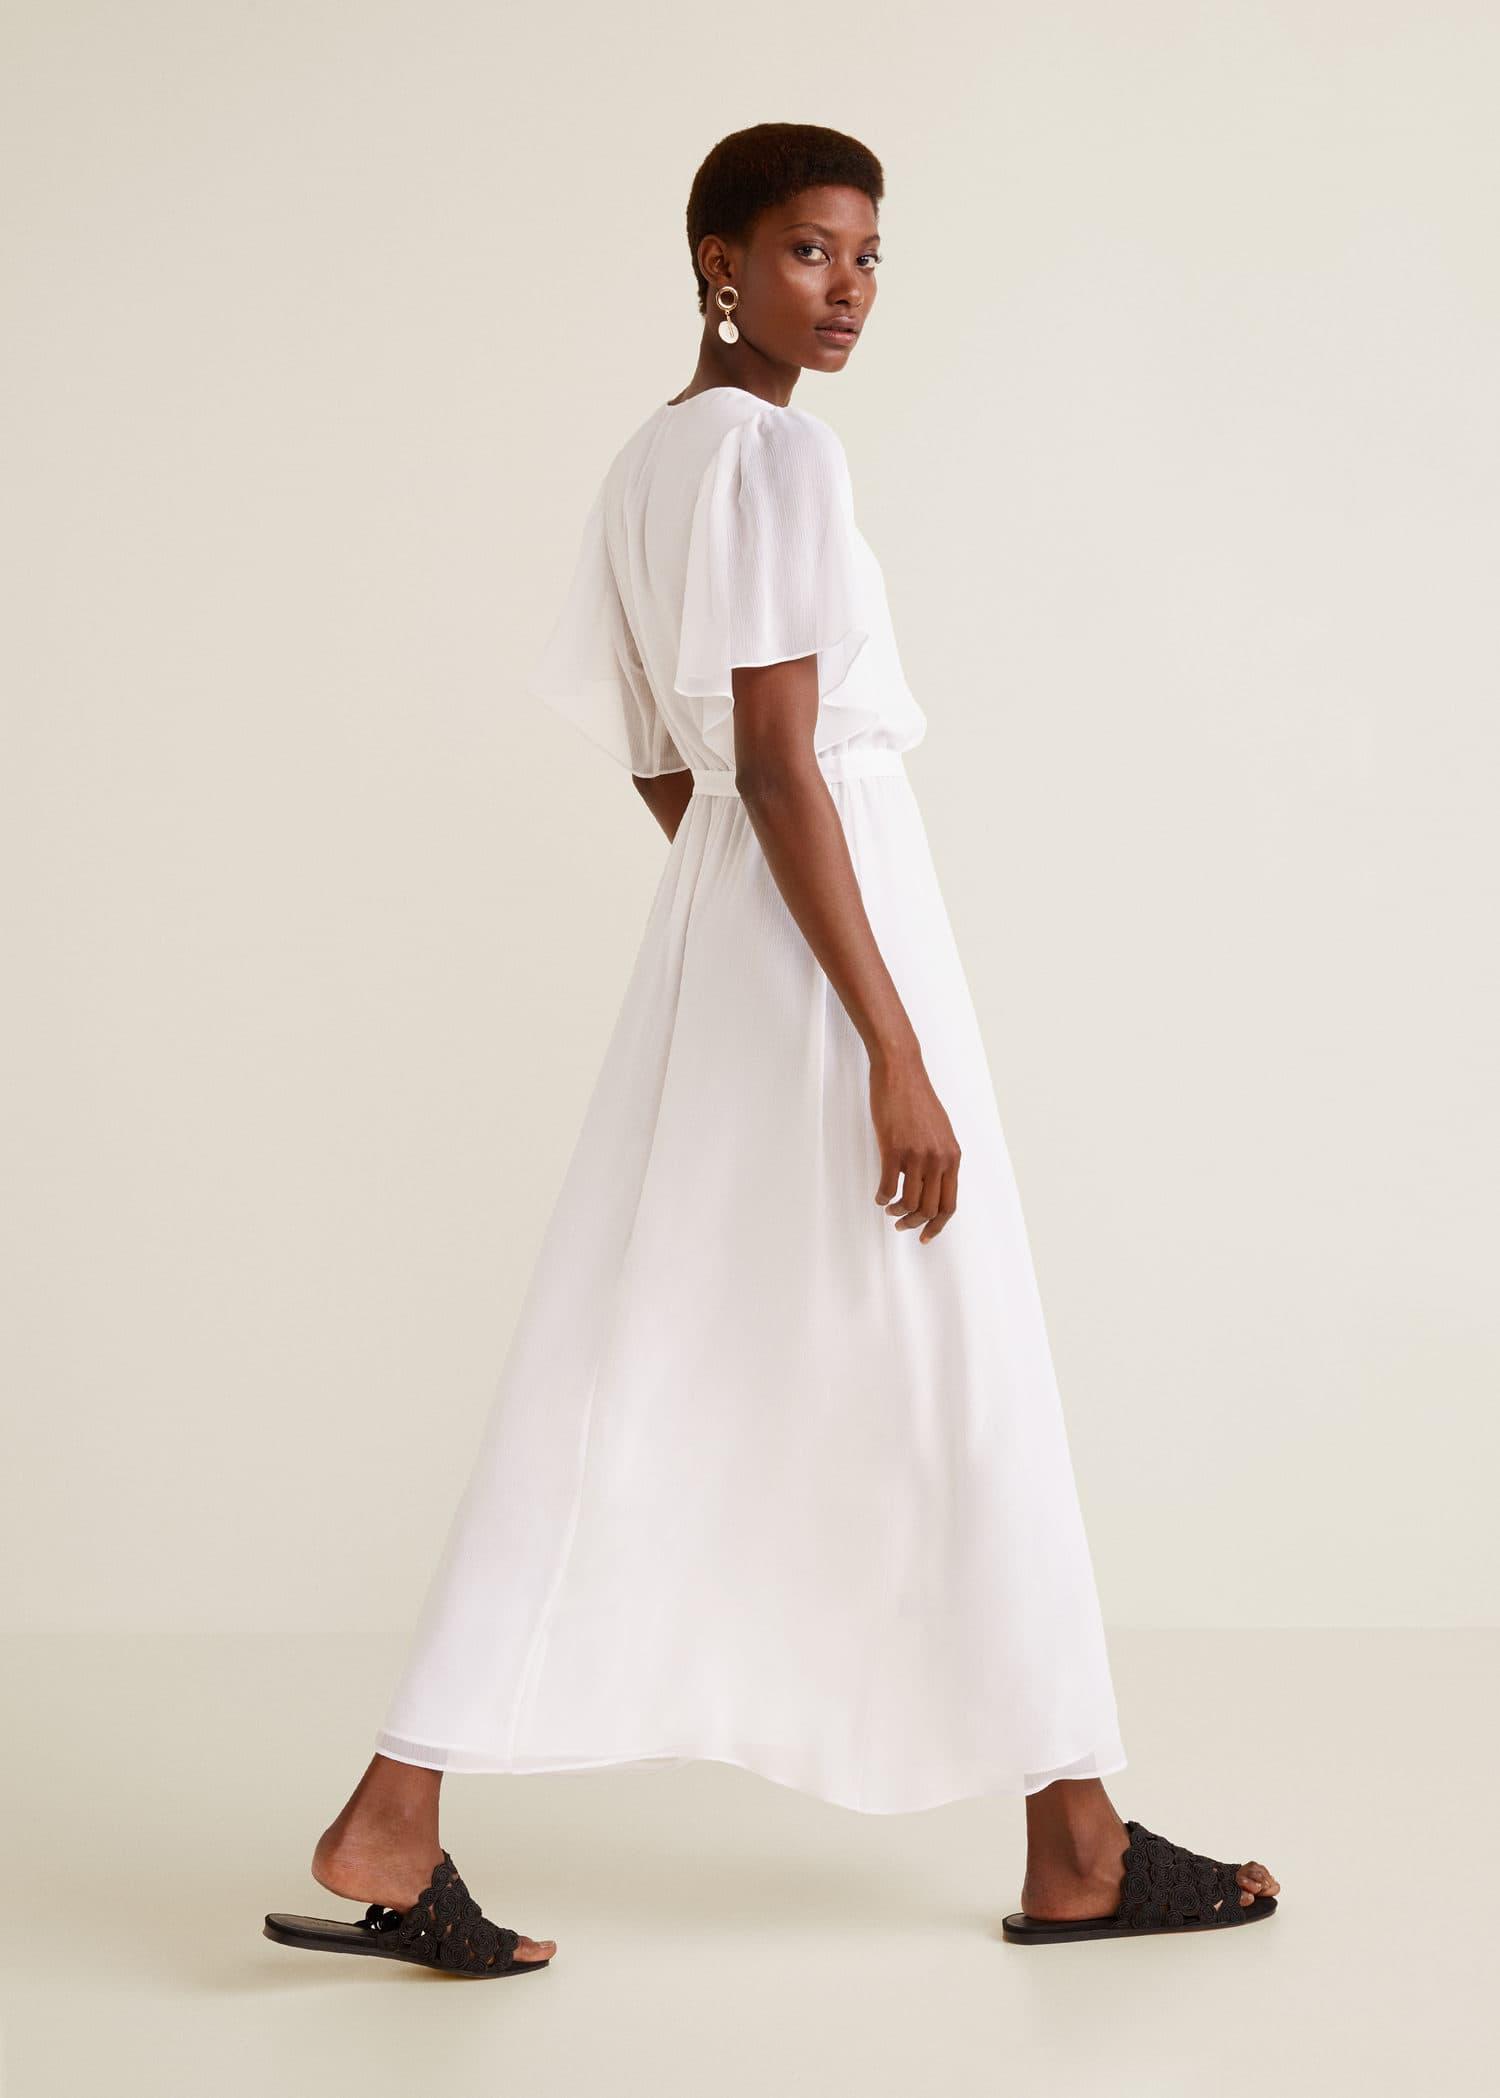 Femme 2019 Mango France Longues Robes Pour EqxFawwS